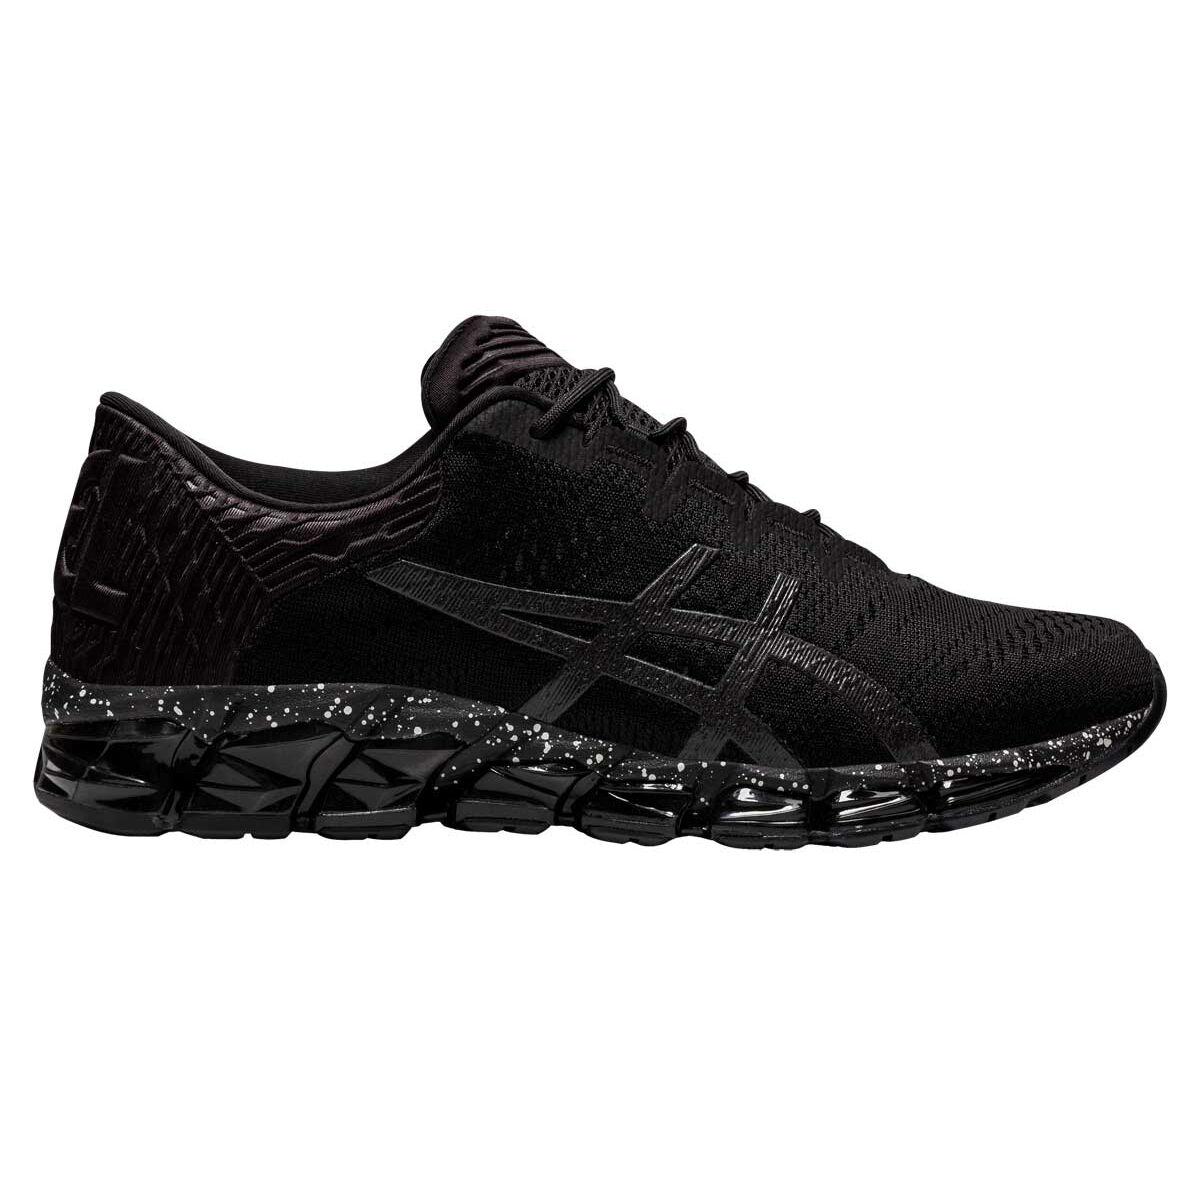 nike flex trainer 6 feminino women | Asics GEL Quantum 360 5 Jacquard Mens Training Shoes